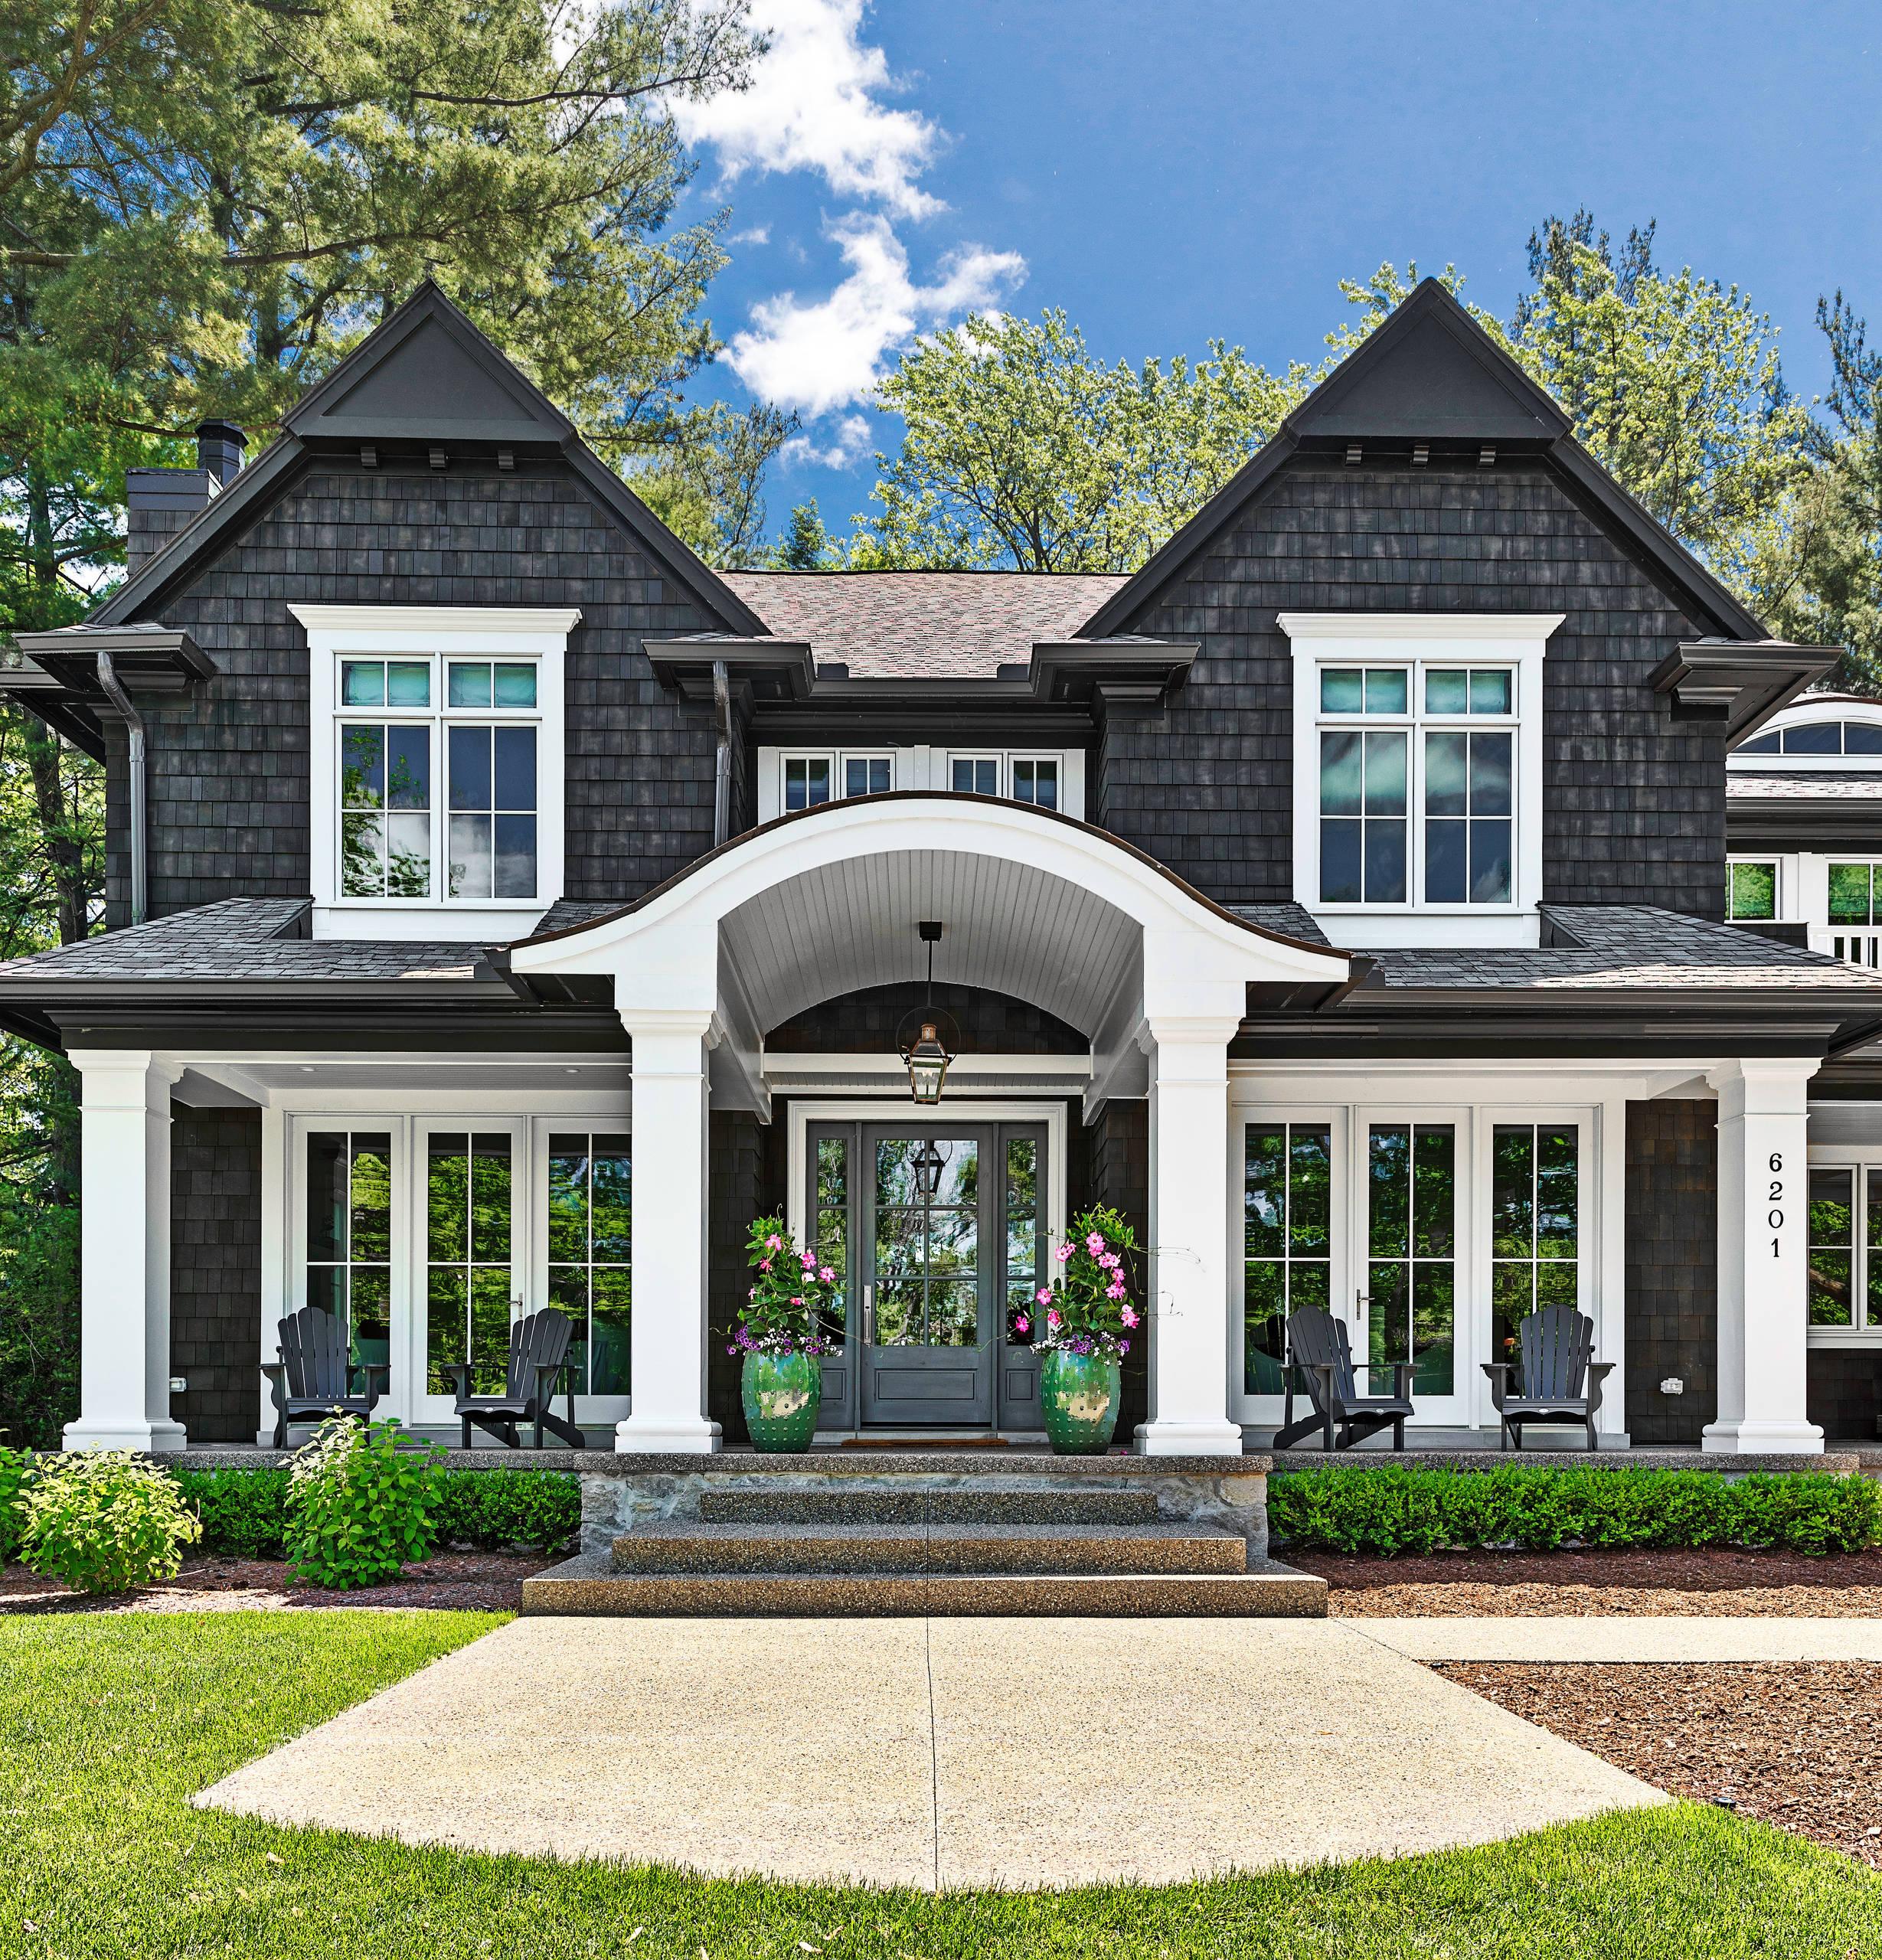 75 Beautiful Coastal Exterior Home Pictures Ideas December 2020 Houzz